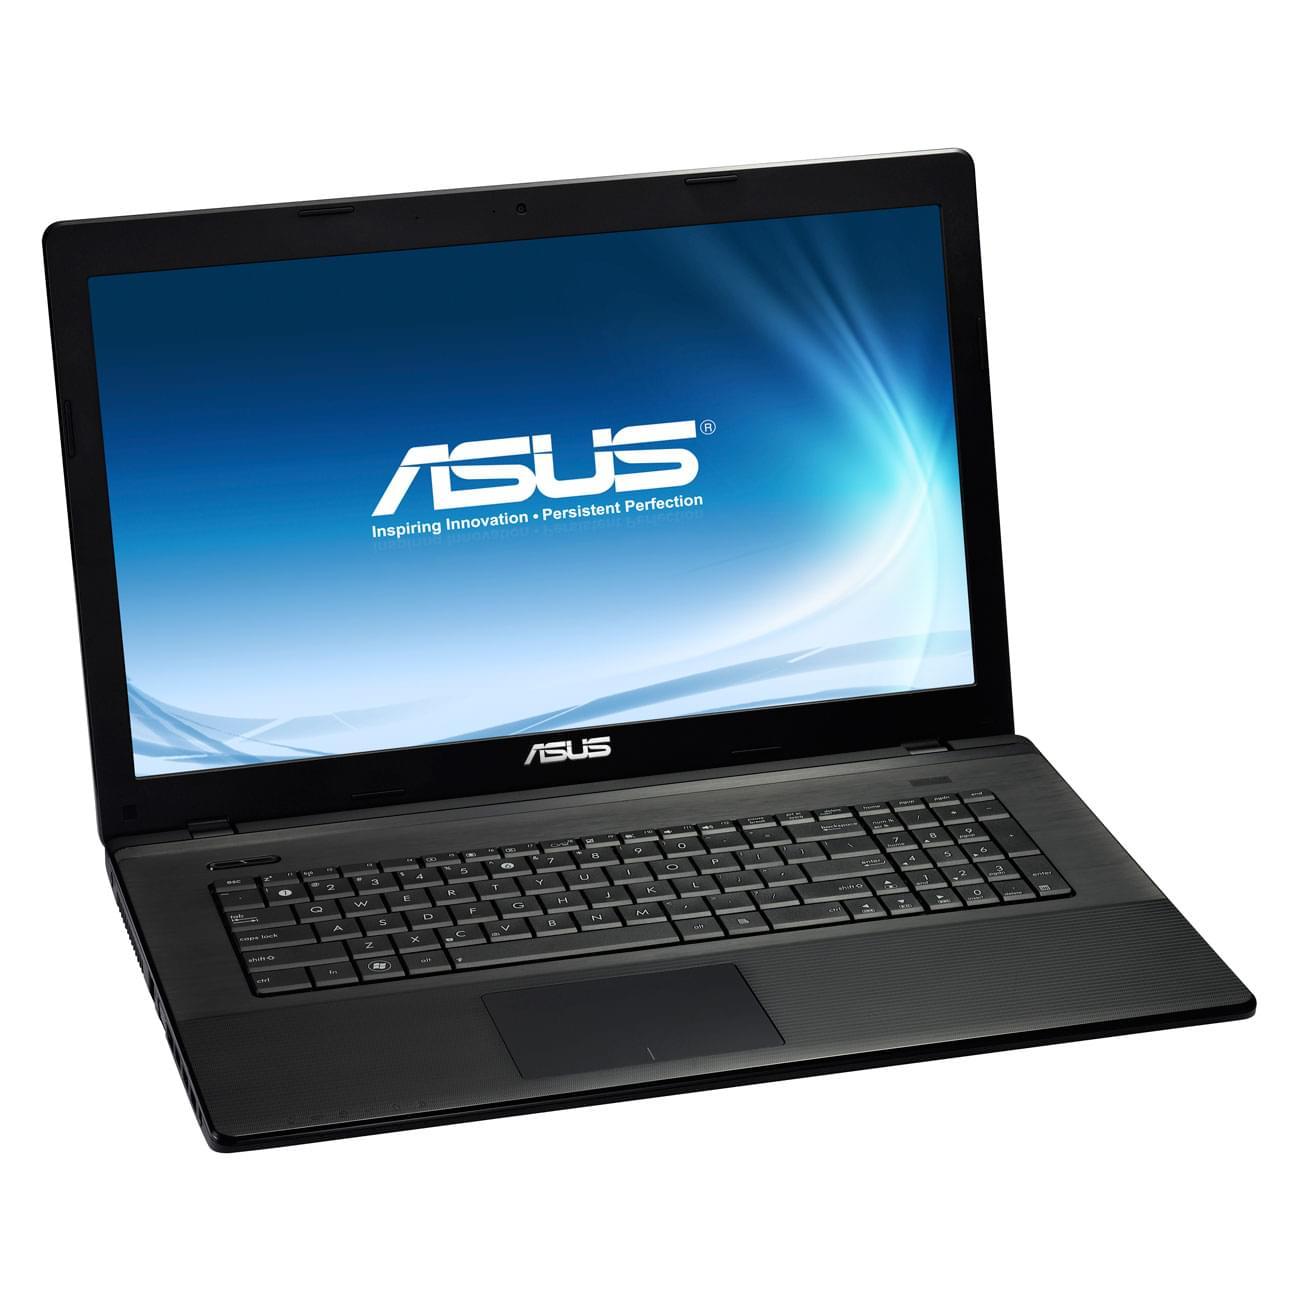 Asus X75A-TY043V - PC portable Asus - Cybertek.fr - 0